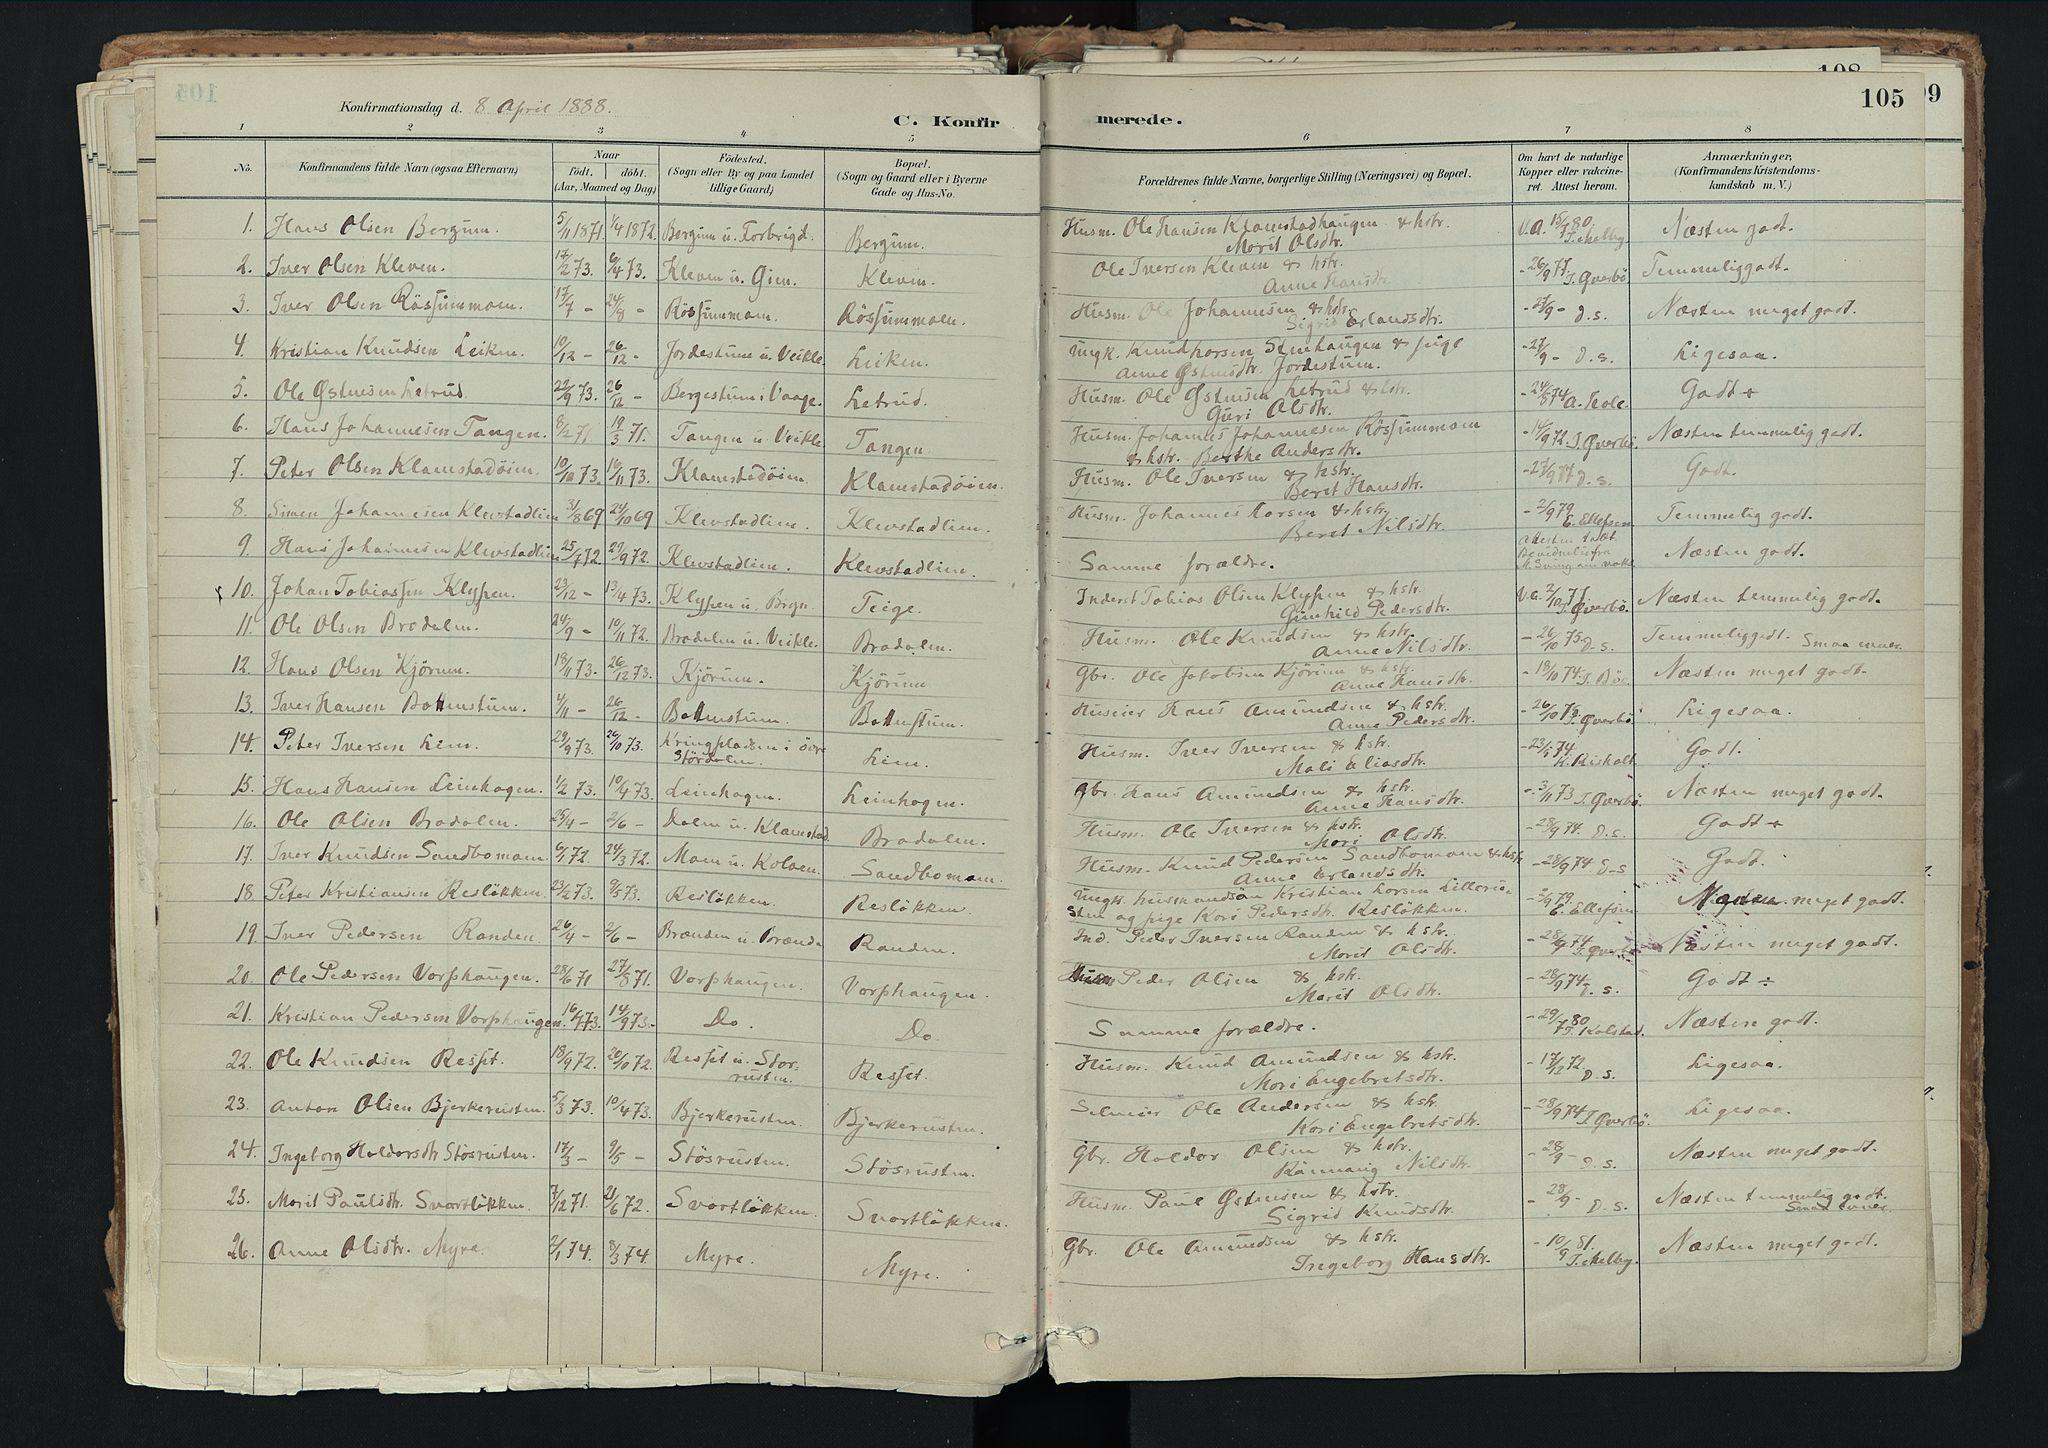 SAH, Nord-Fron prestekontor, Ministerialbok nr. 3, 1884-1914, s. 105